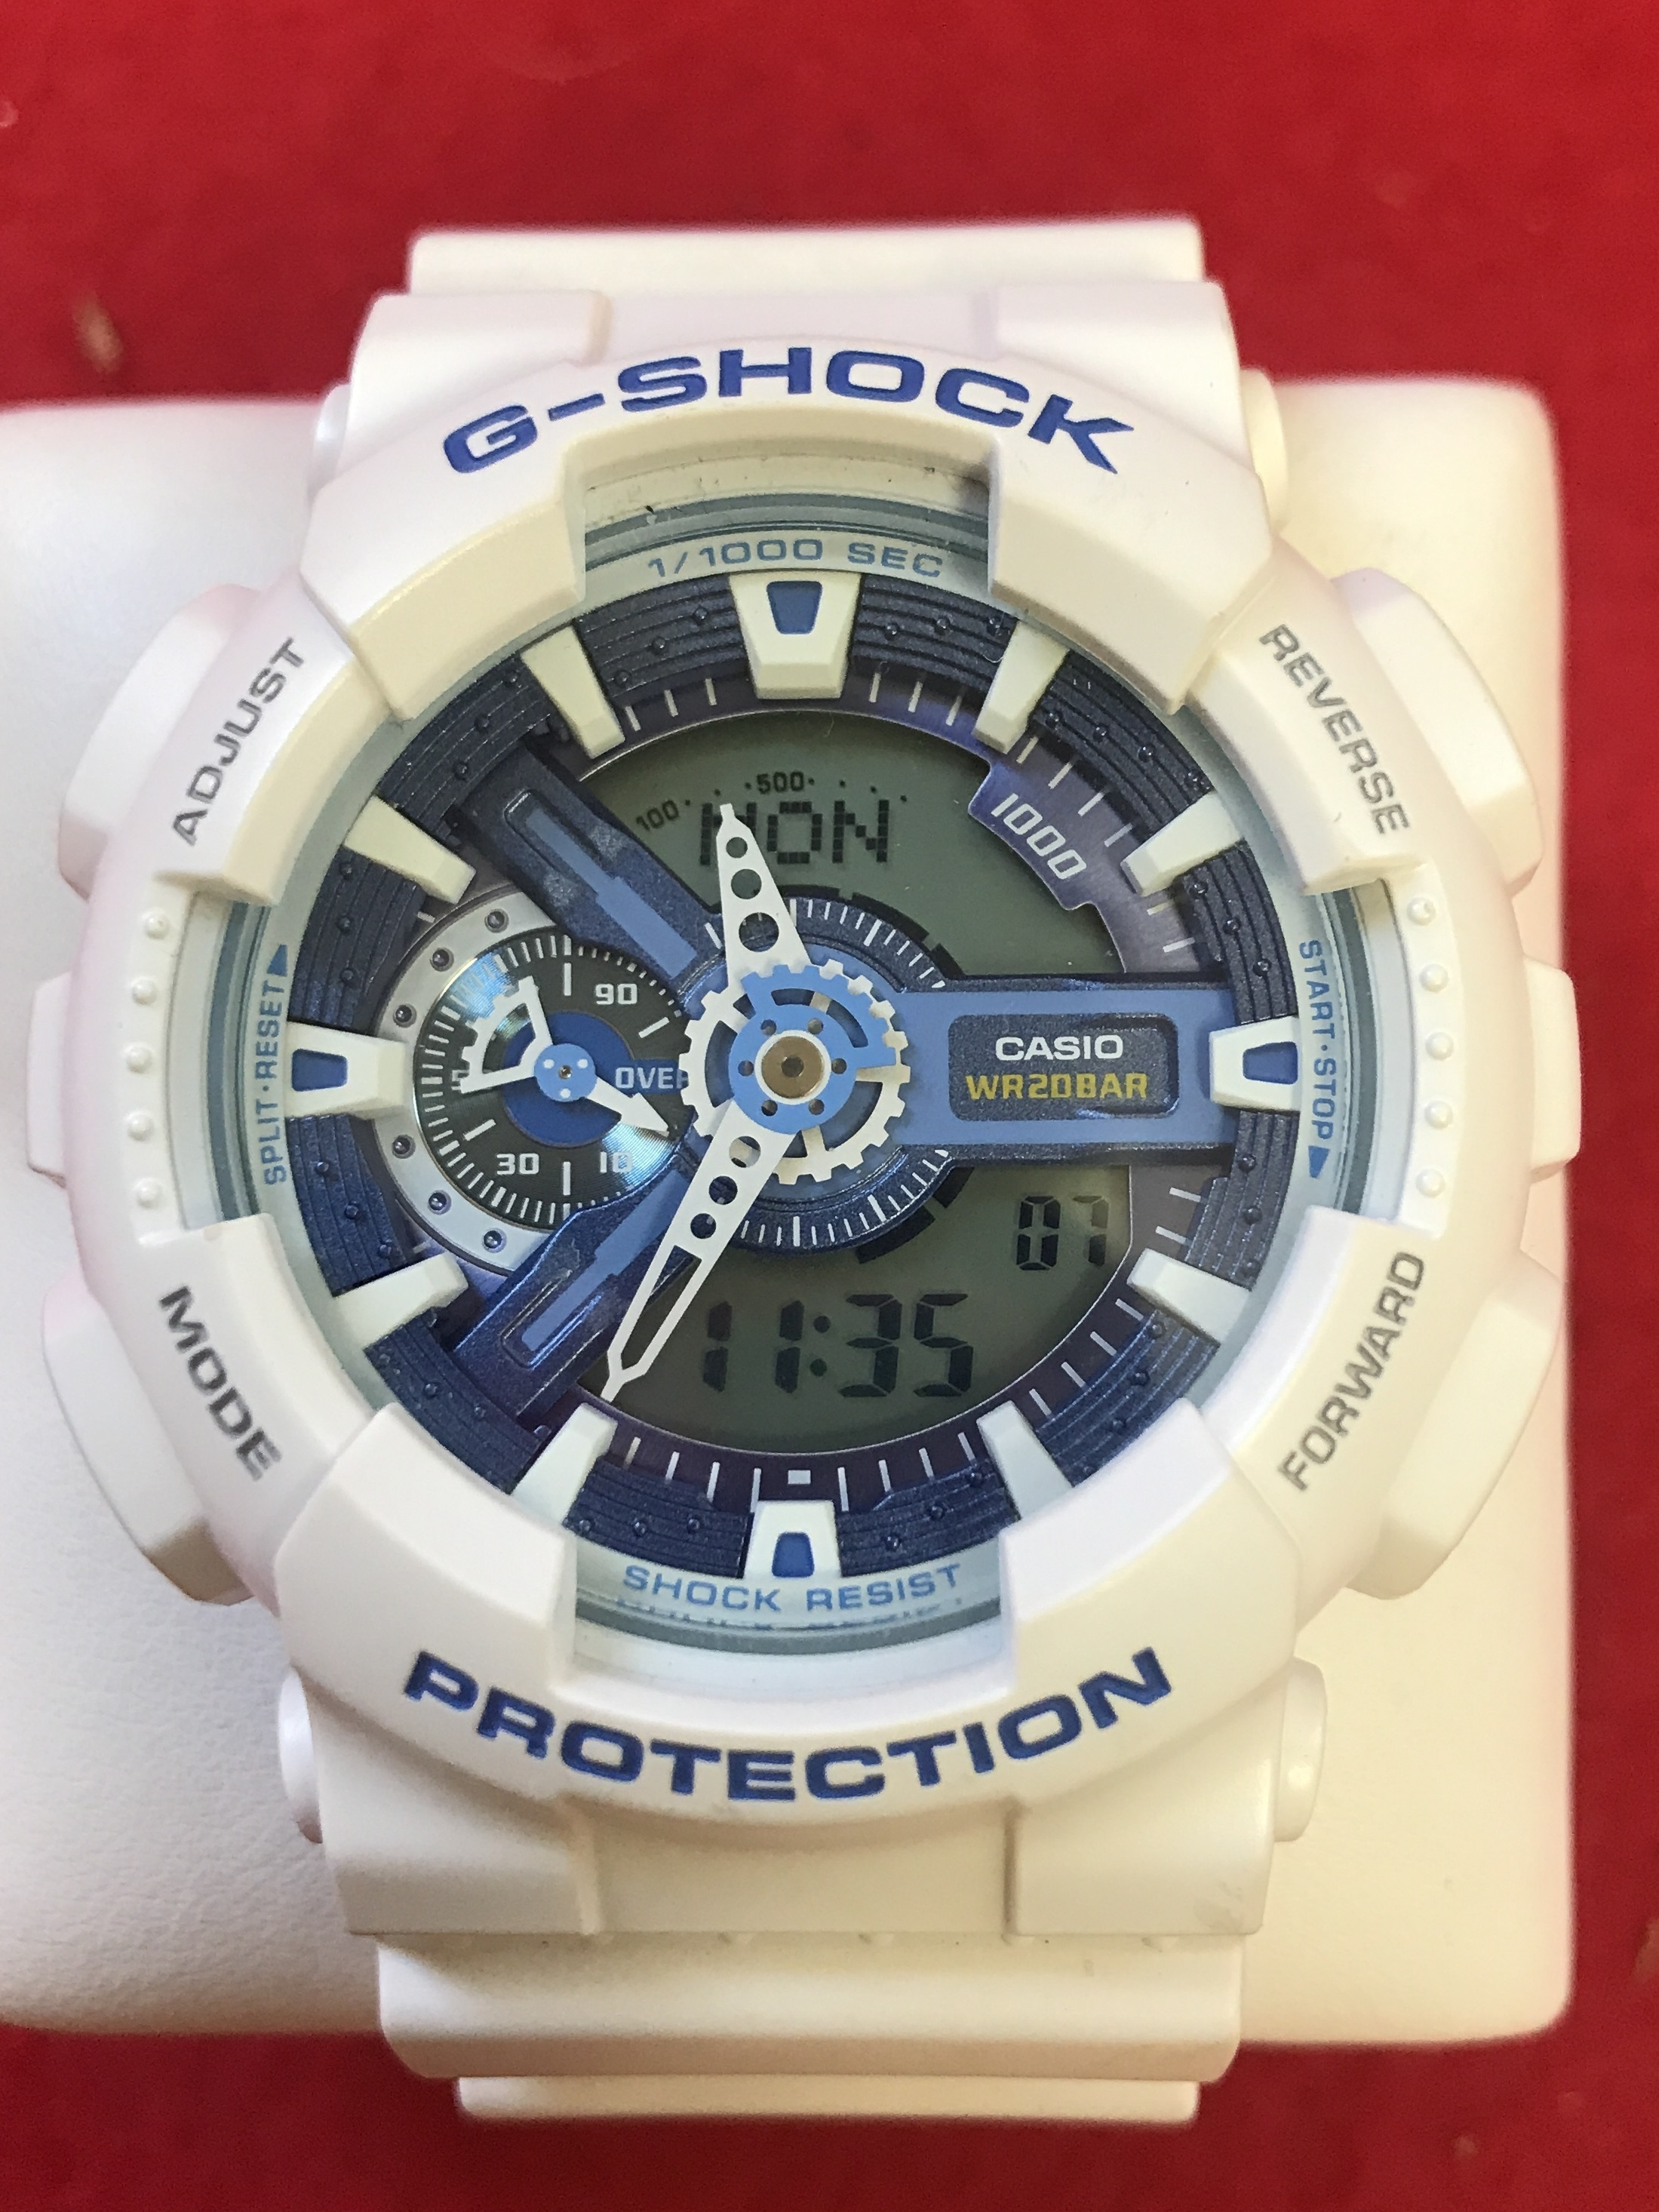 G-SHOCK  GA-110WB  WATCH